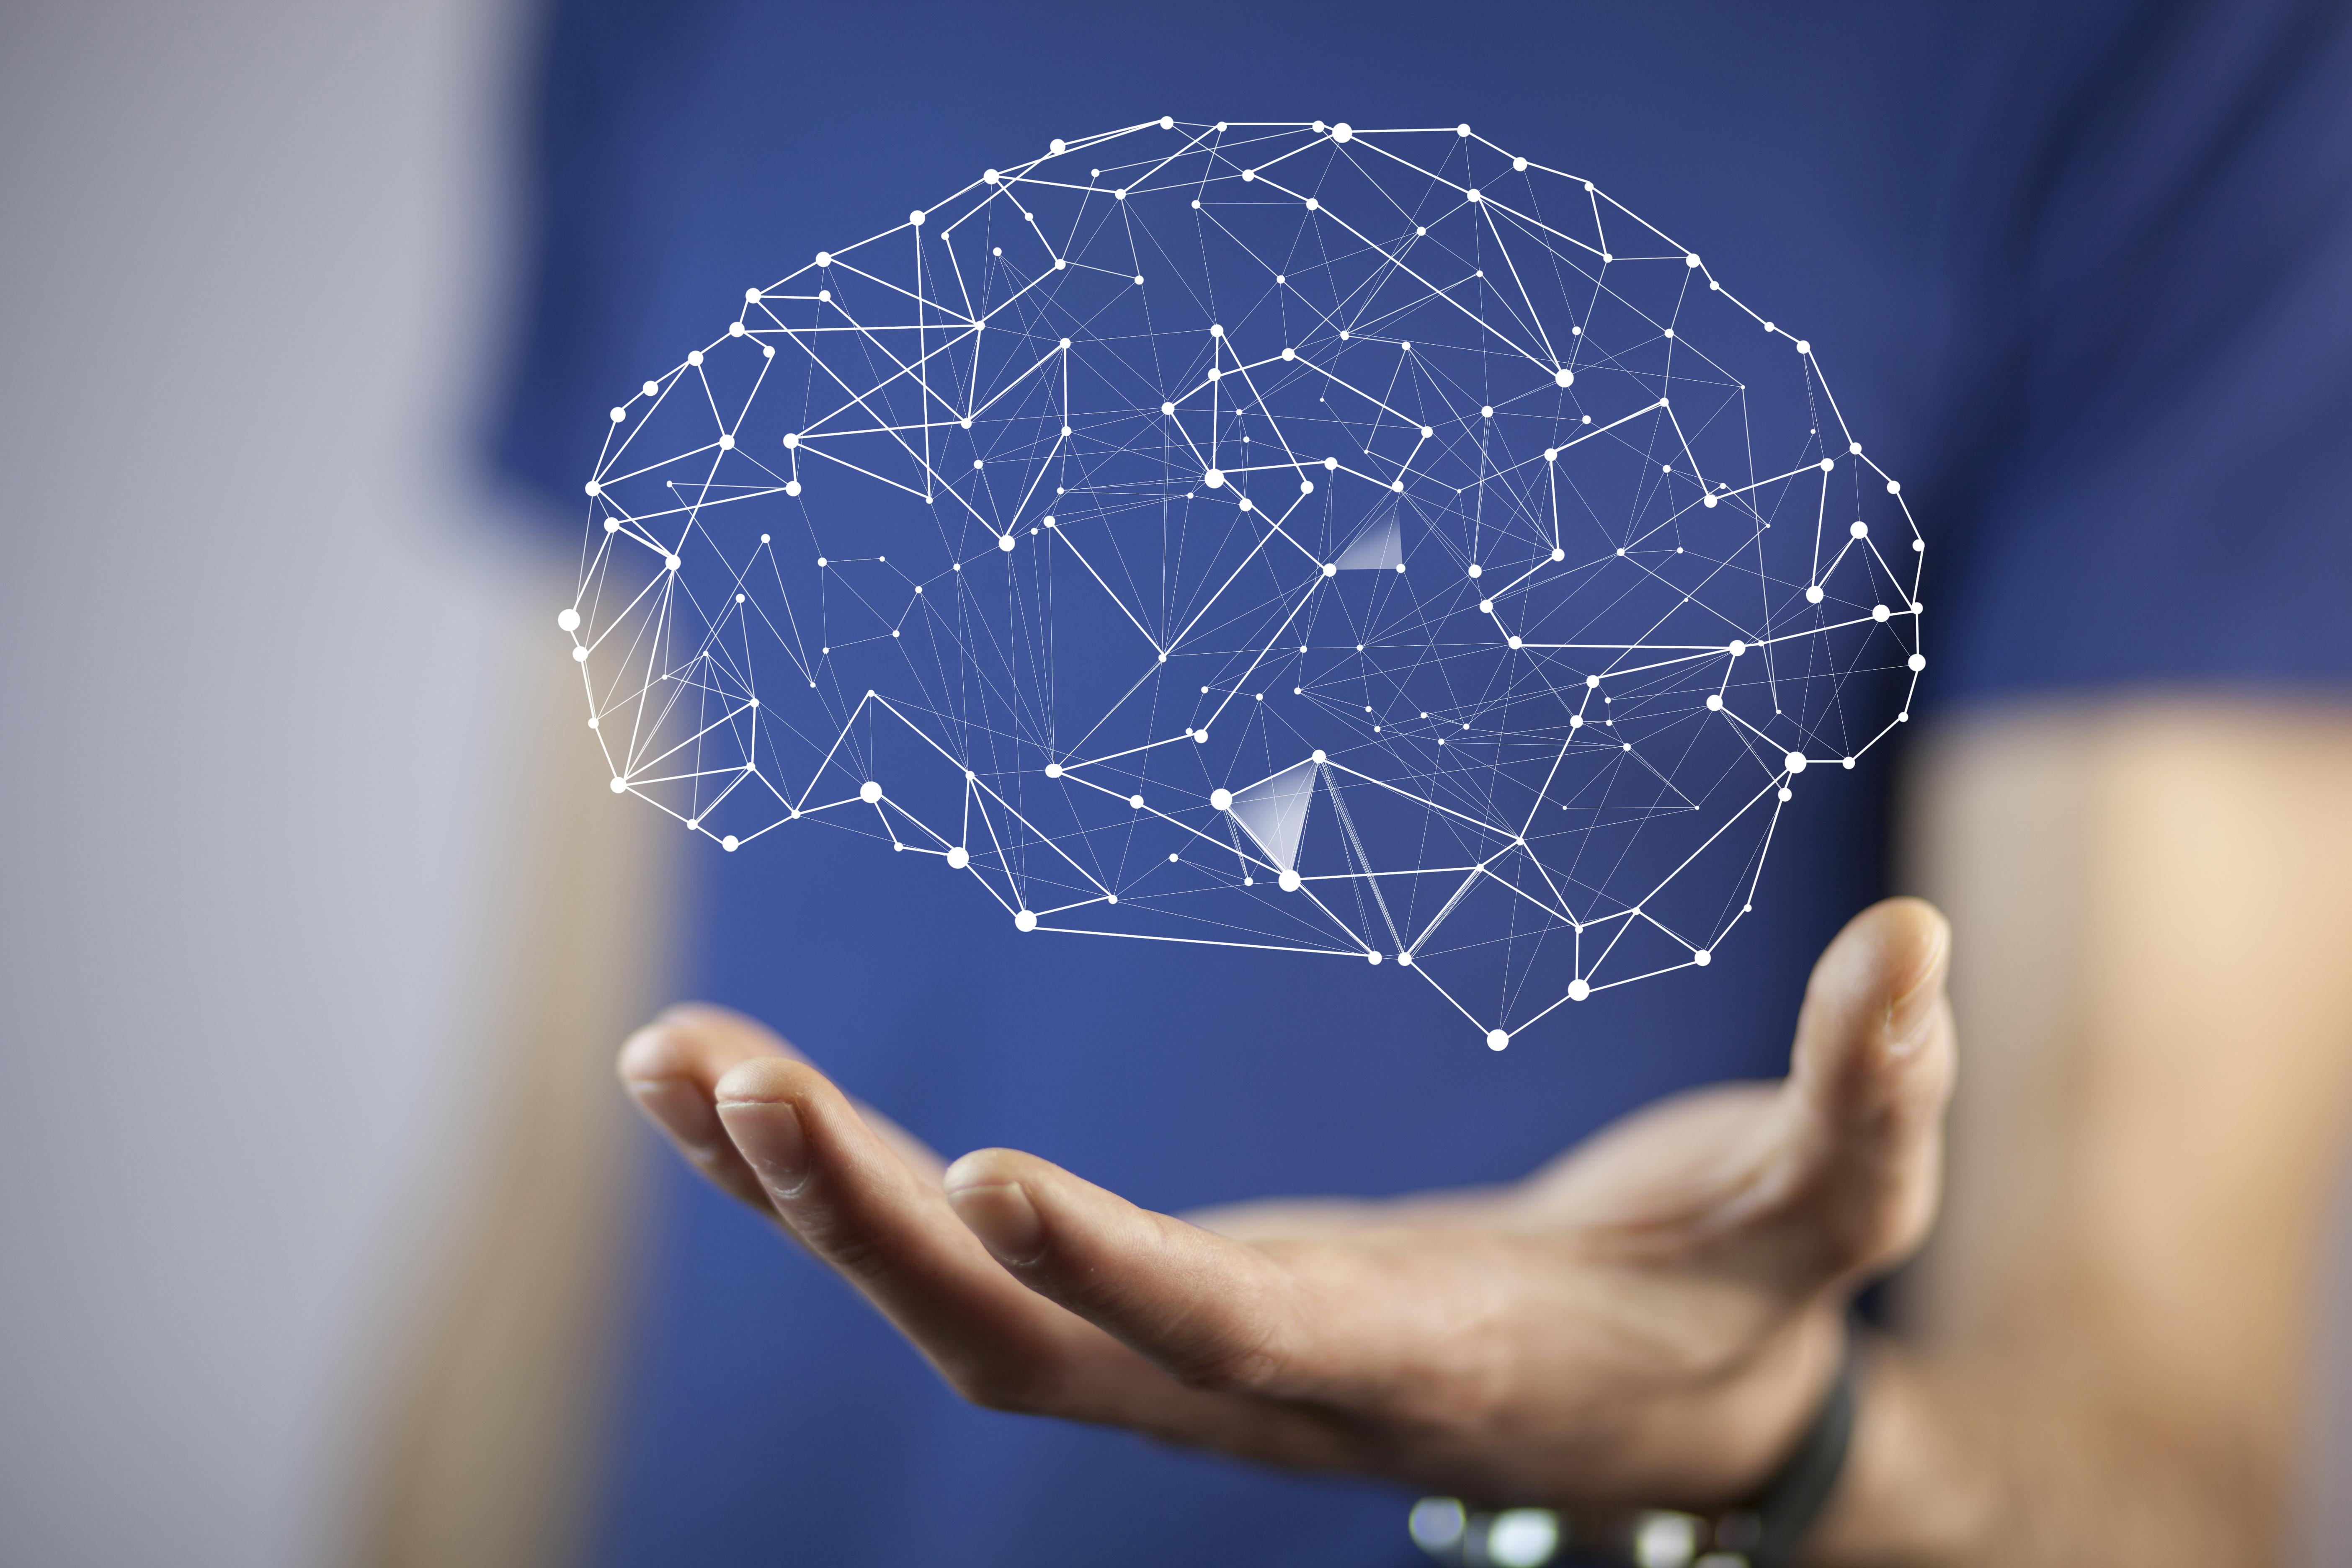 8 Ways Neuroscience Can Unlock Employee Potential